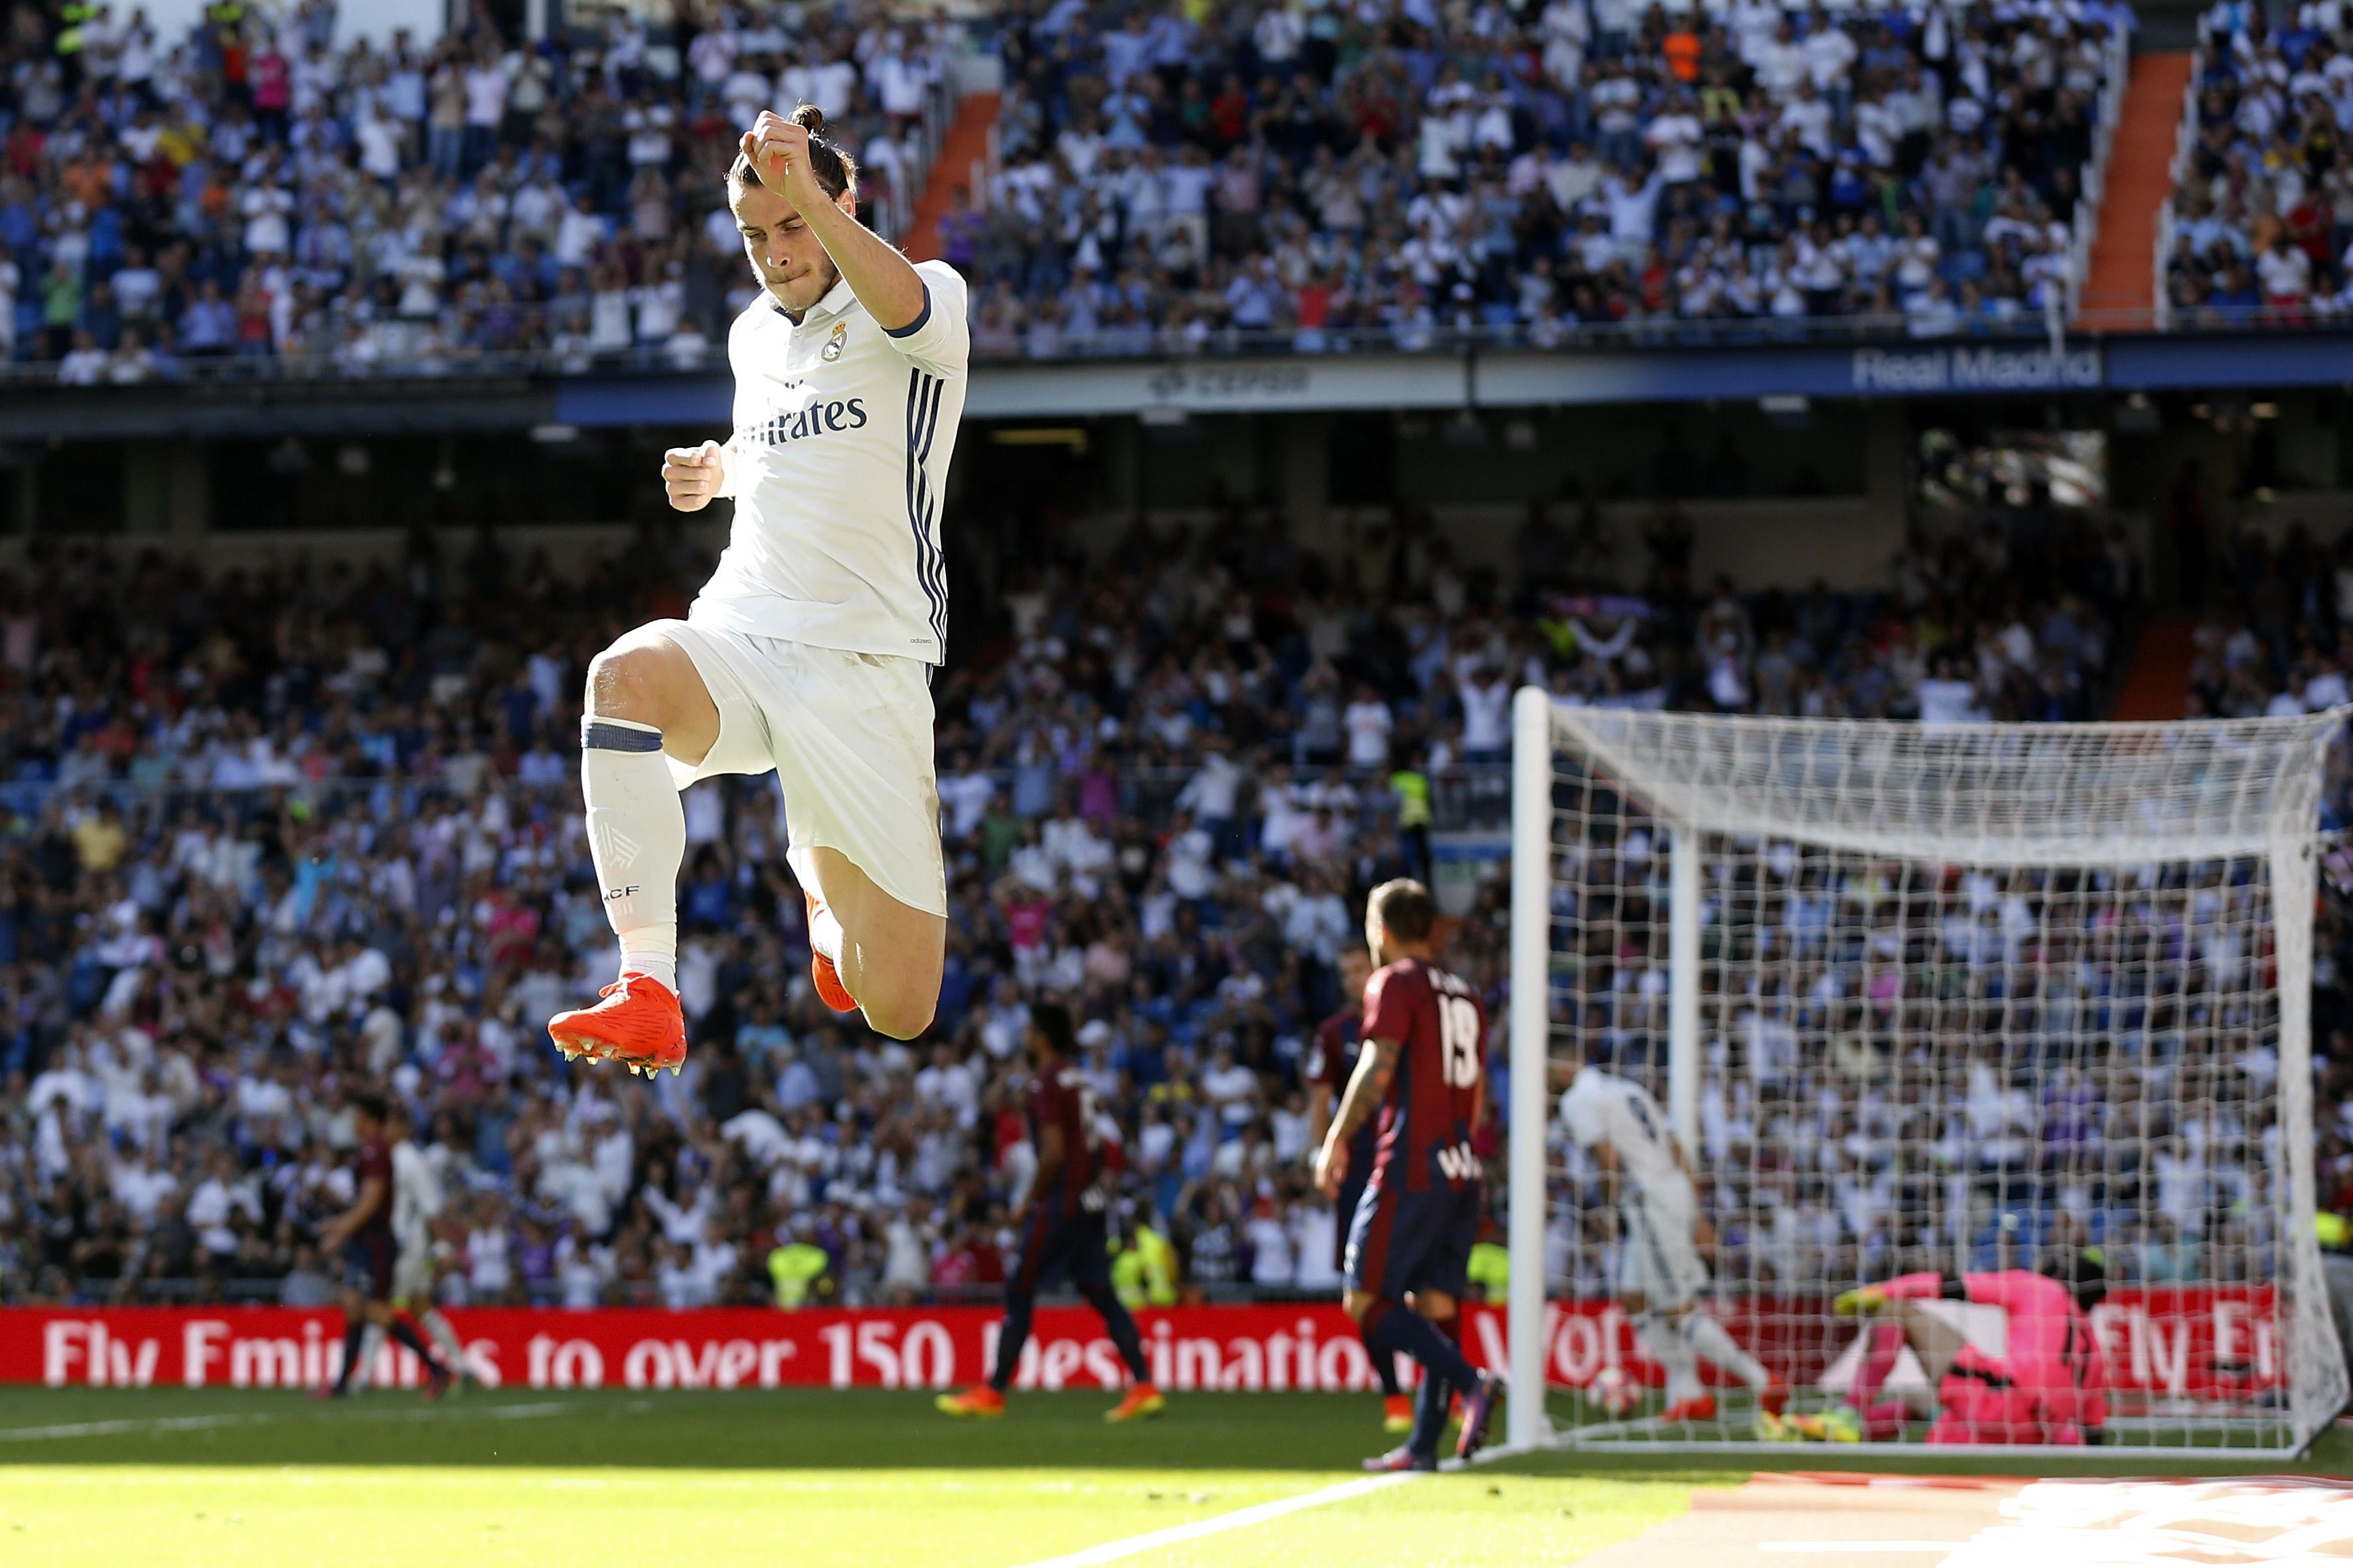 Watch Getafe Cf Vs Real Madrid Live Stream La Liga: Real Madrid Vs. Betis Live Stream: Watch La Liga Online